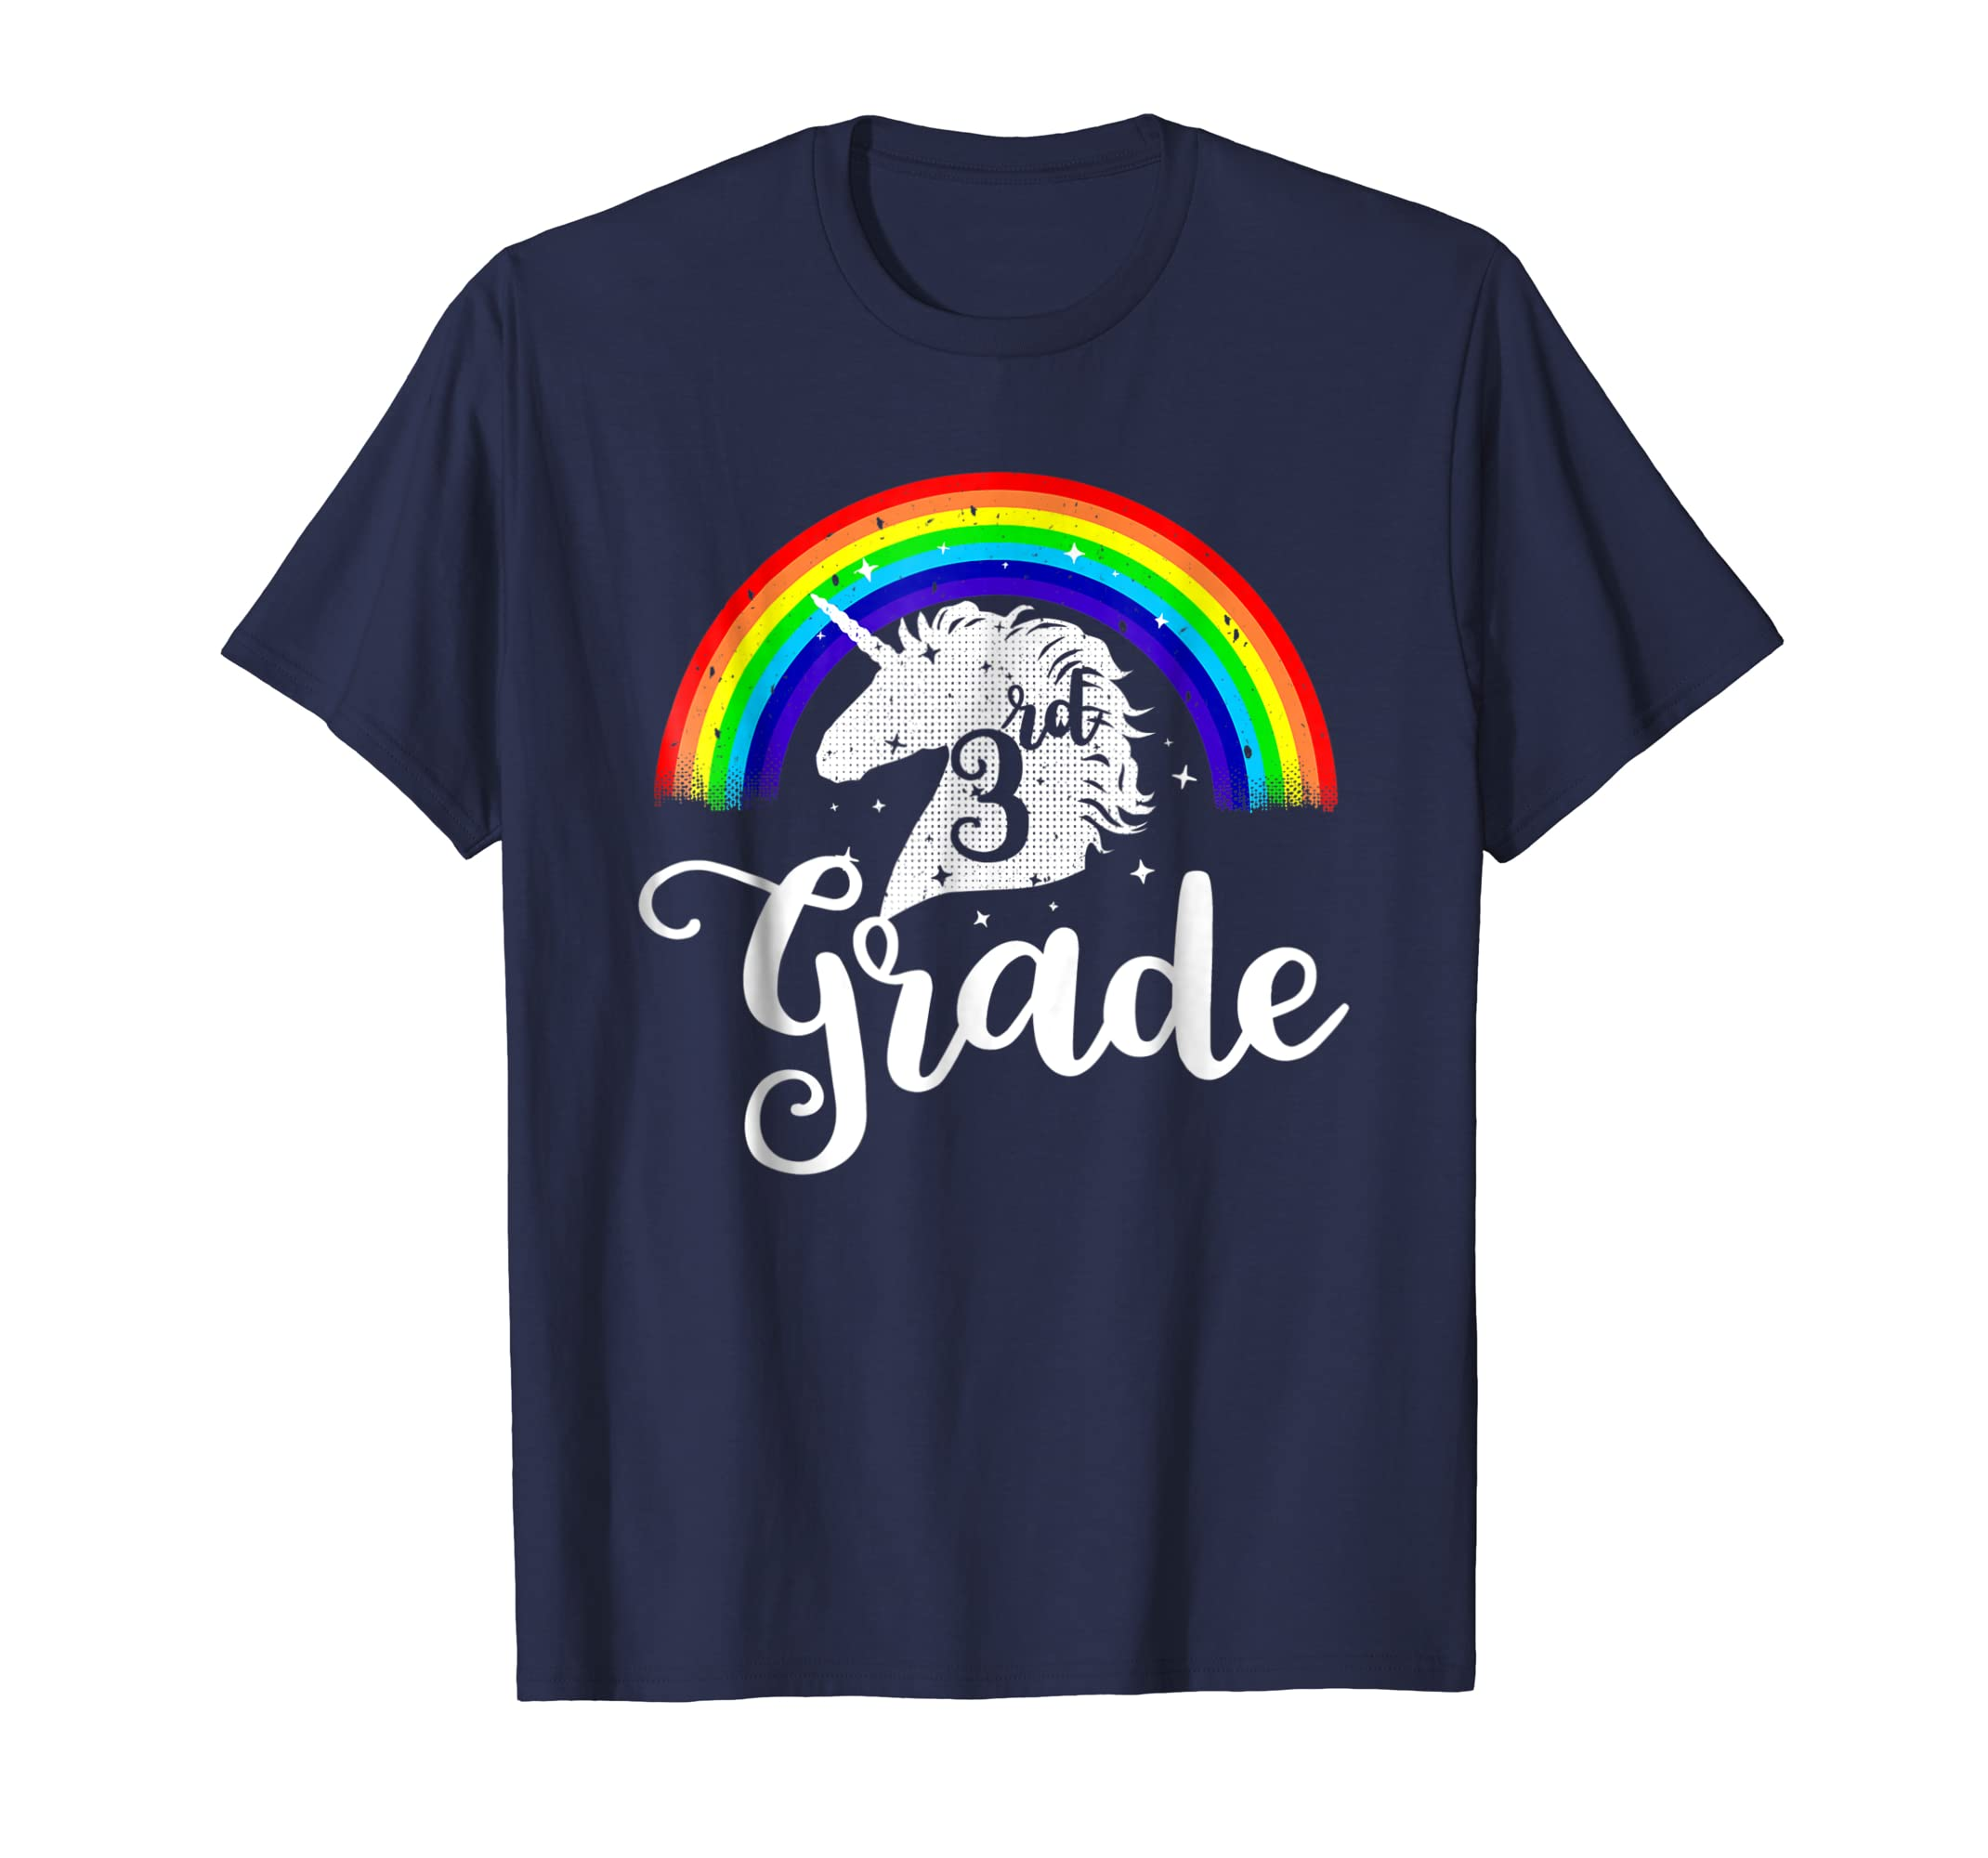 3rd Unicorn Grade Teacher Shirts Back To School GiftTee-Awarplus